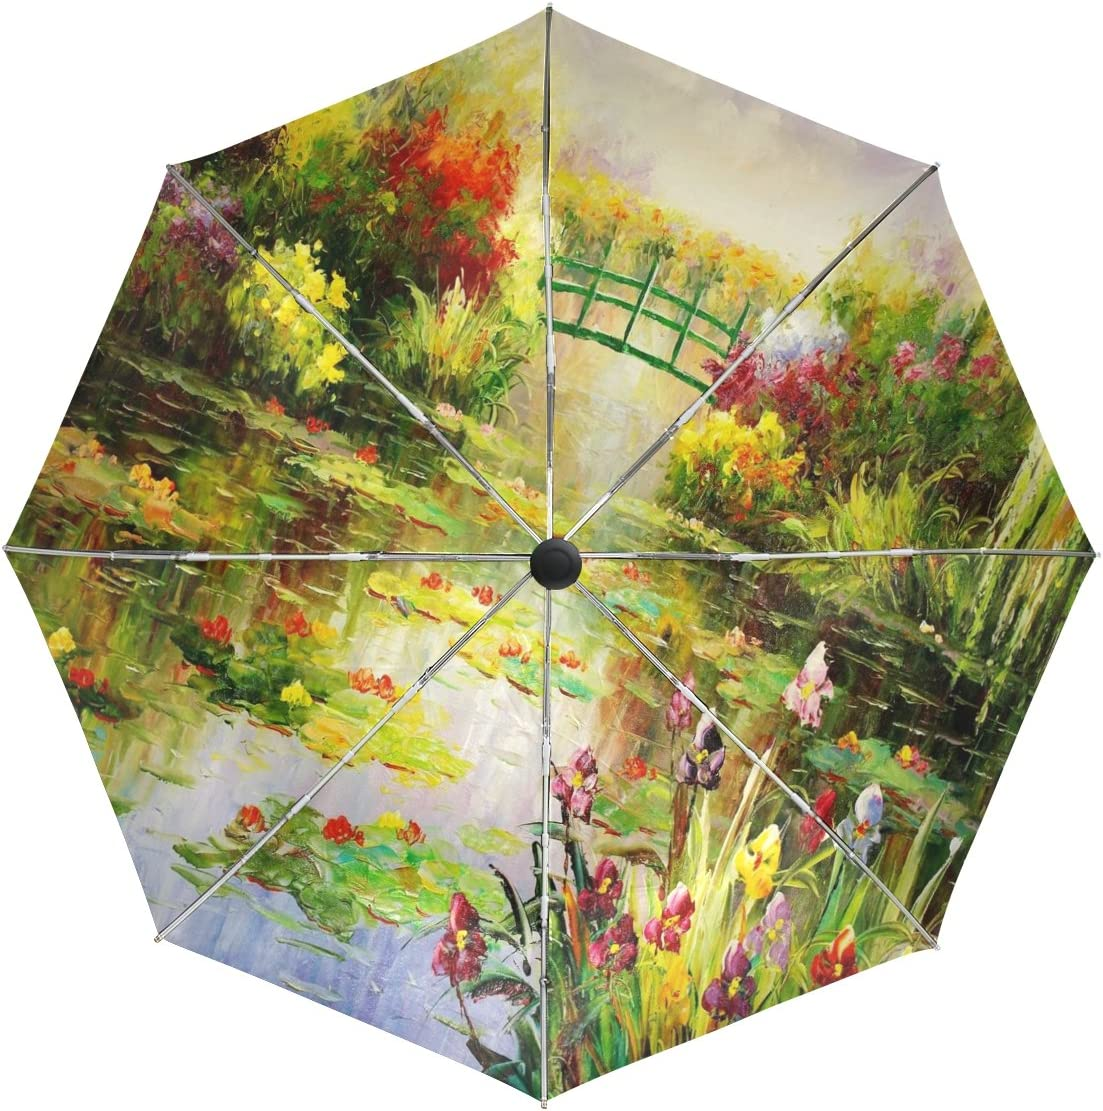 baihuishop Monet Cheap Super special price super special price Painting Windproof Umbrellas Auto Close 3 Open